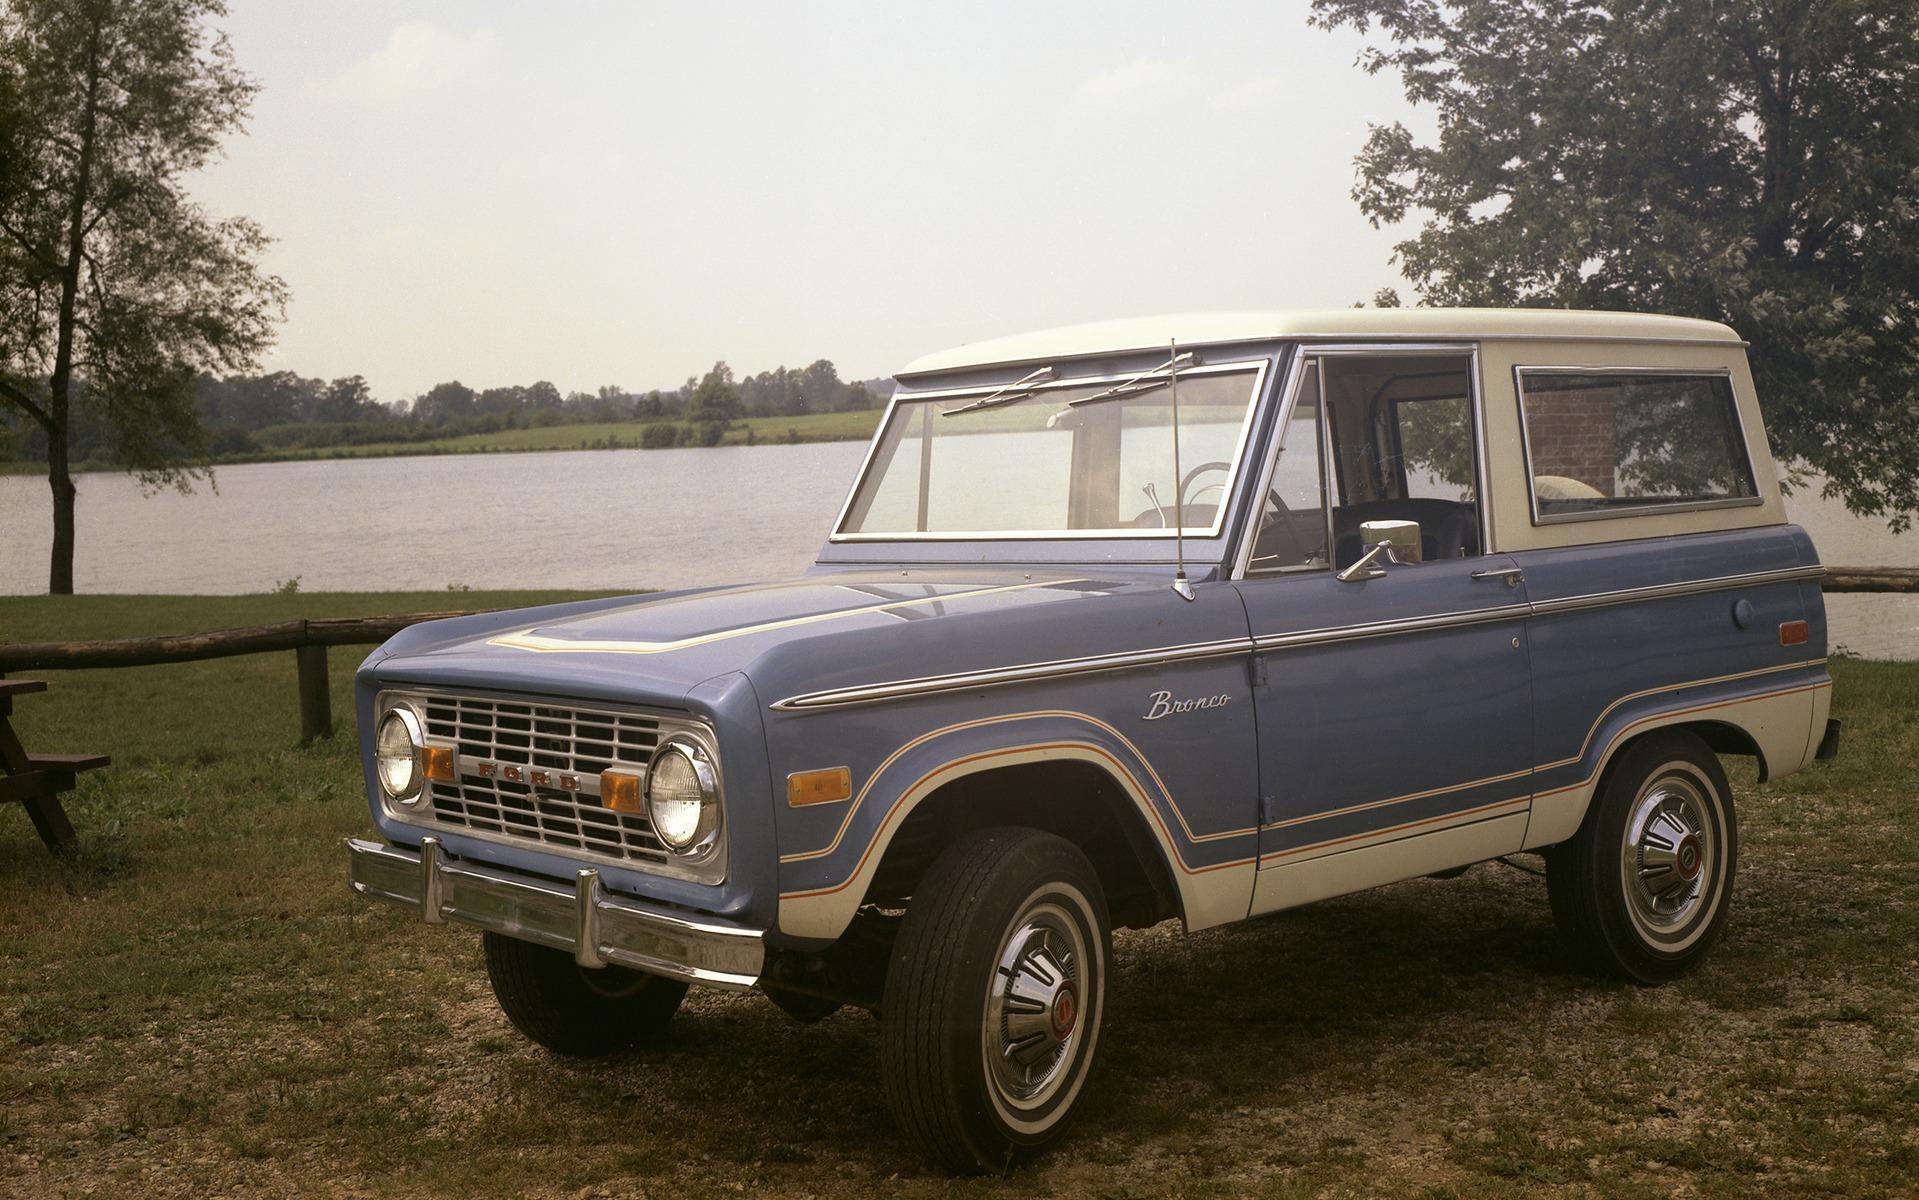 <p>Ford Bronco 1973</p>